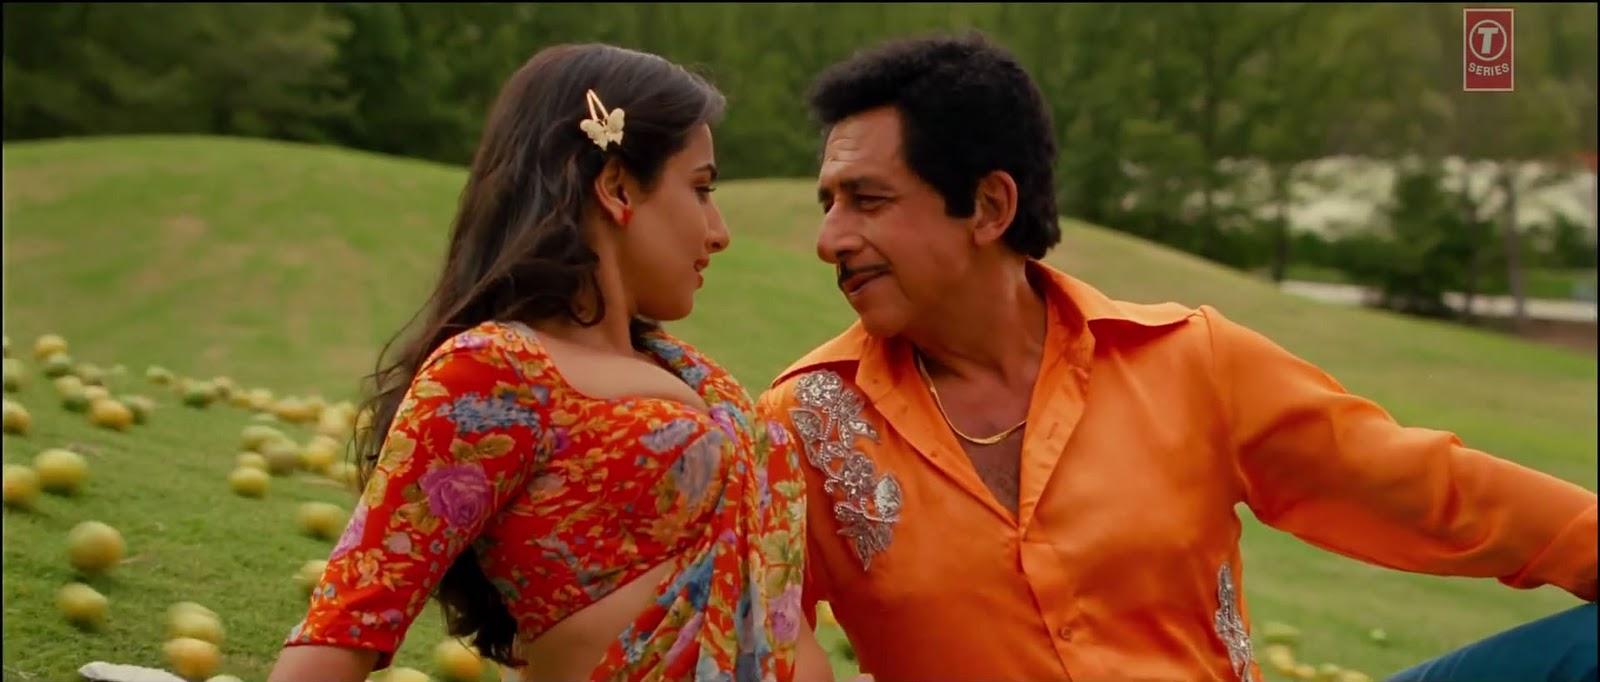 free movie download bollywood in hindi hd mp4